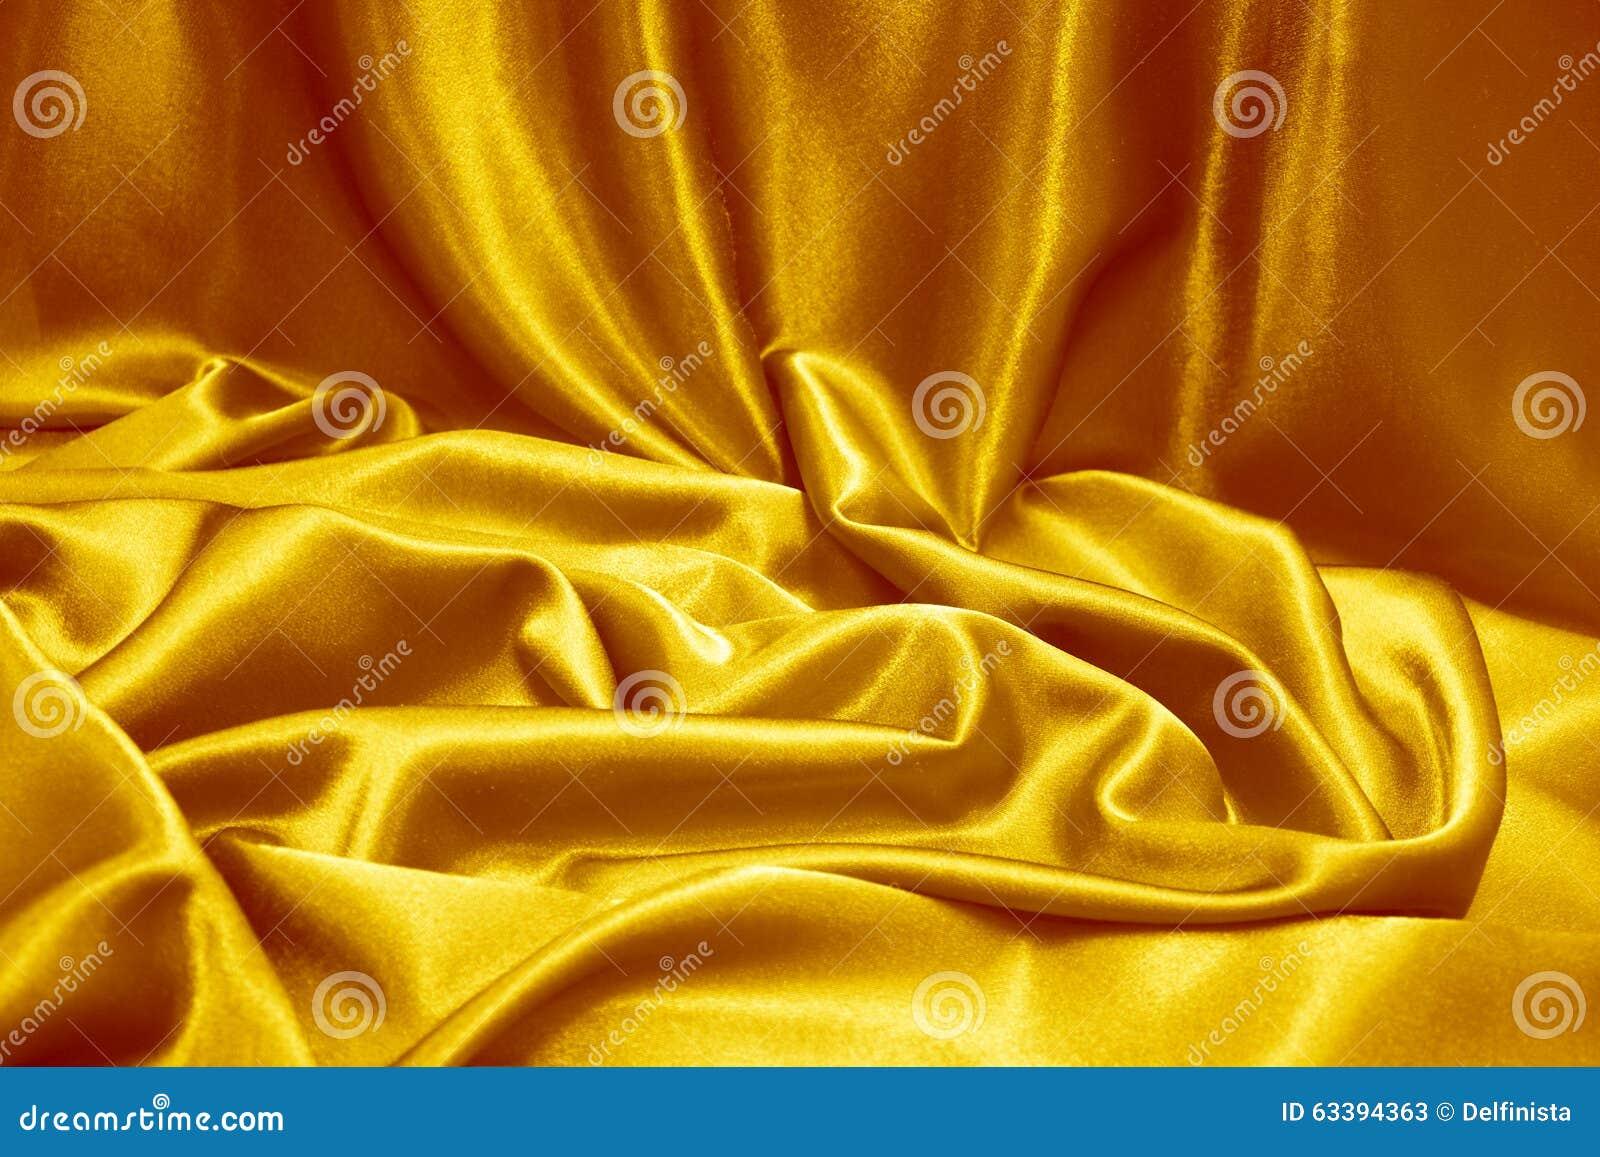 gold satin background - photo #32